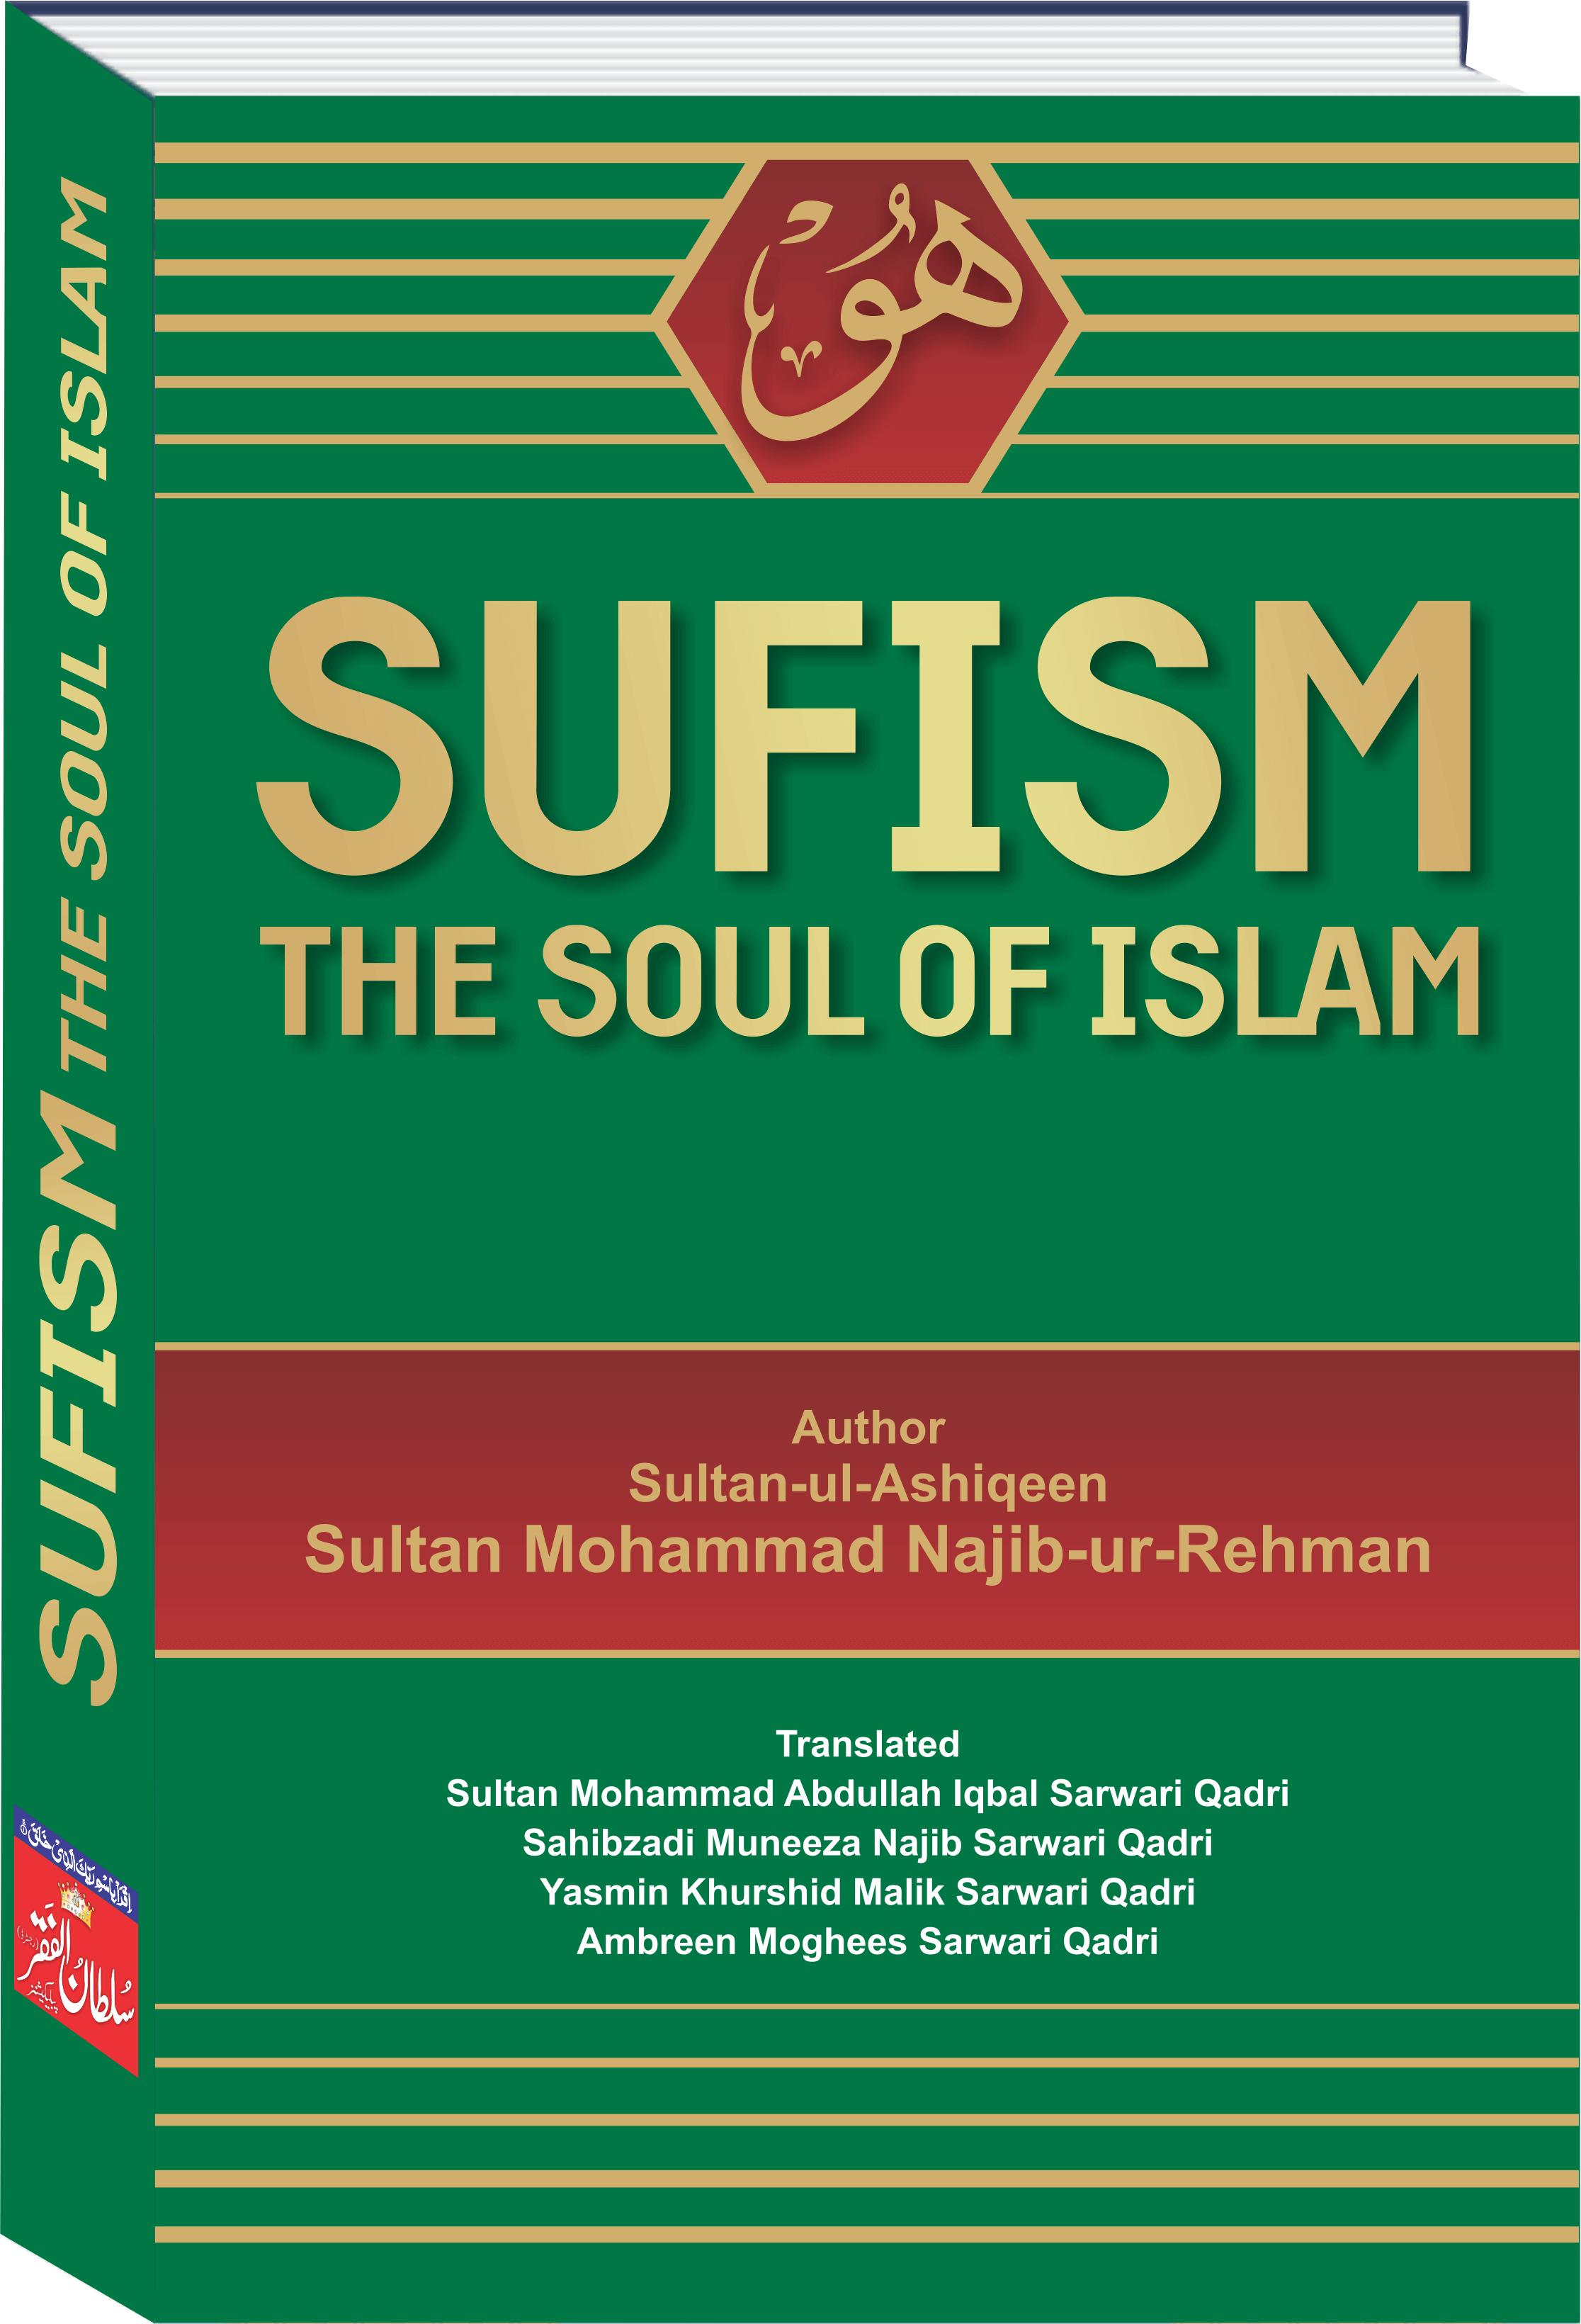 Sufism – The Soul of Islam English Translation